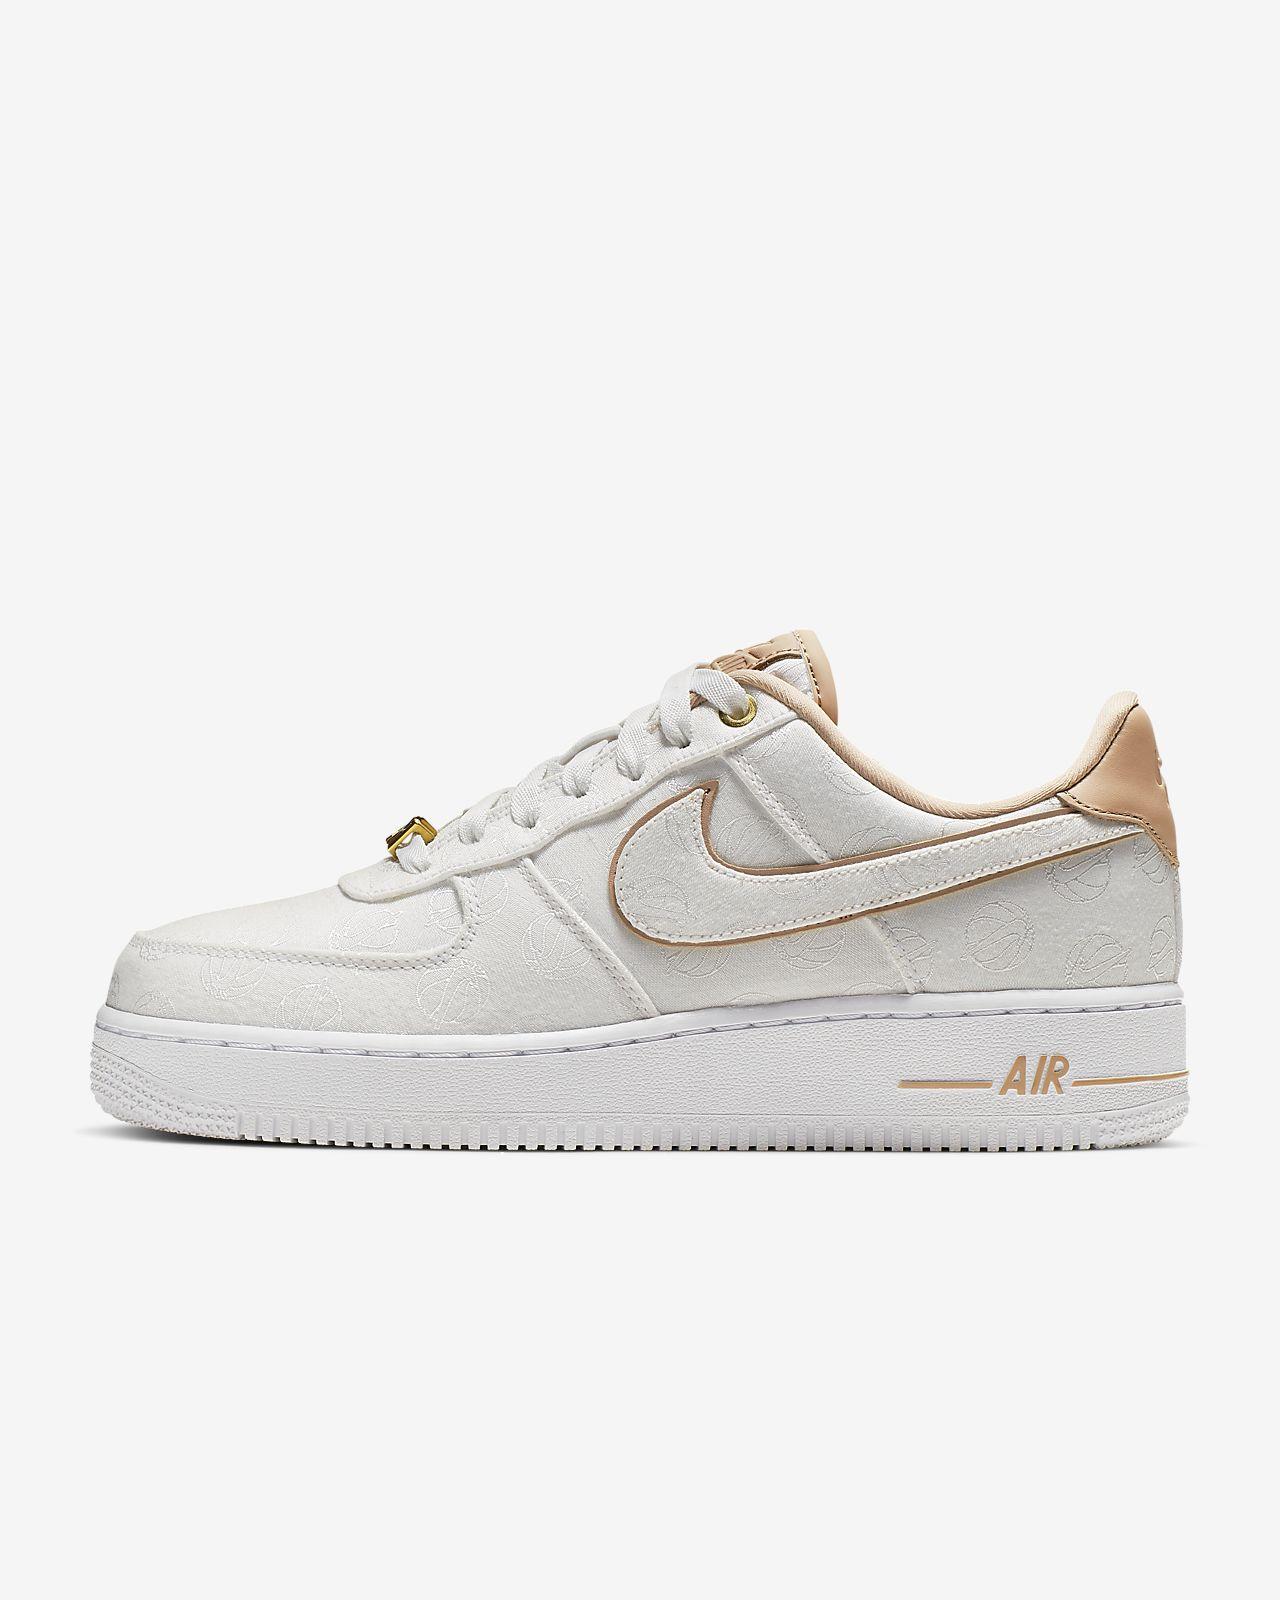 Calzado para mujer Nike Air Force 1 '07 Lux